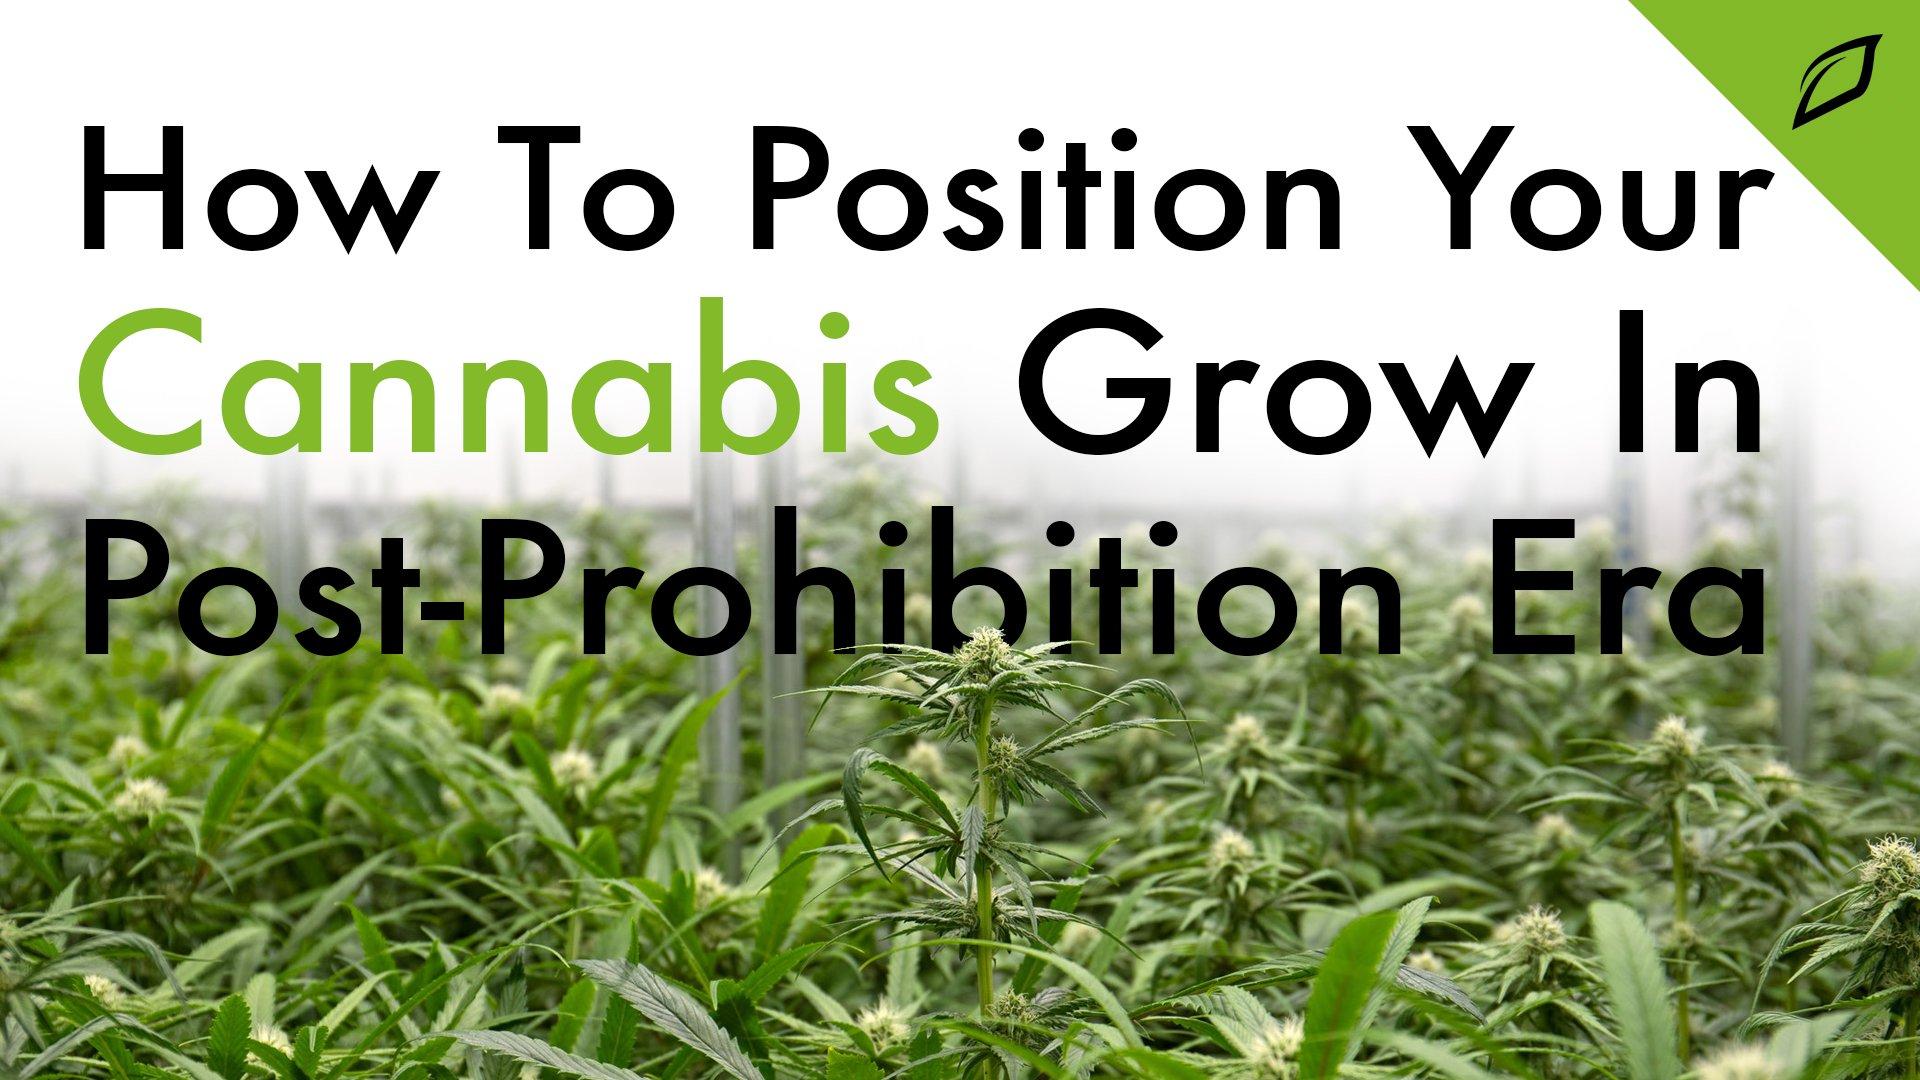 Prohabition Blog 16x9